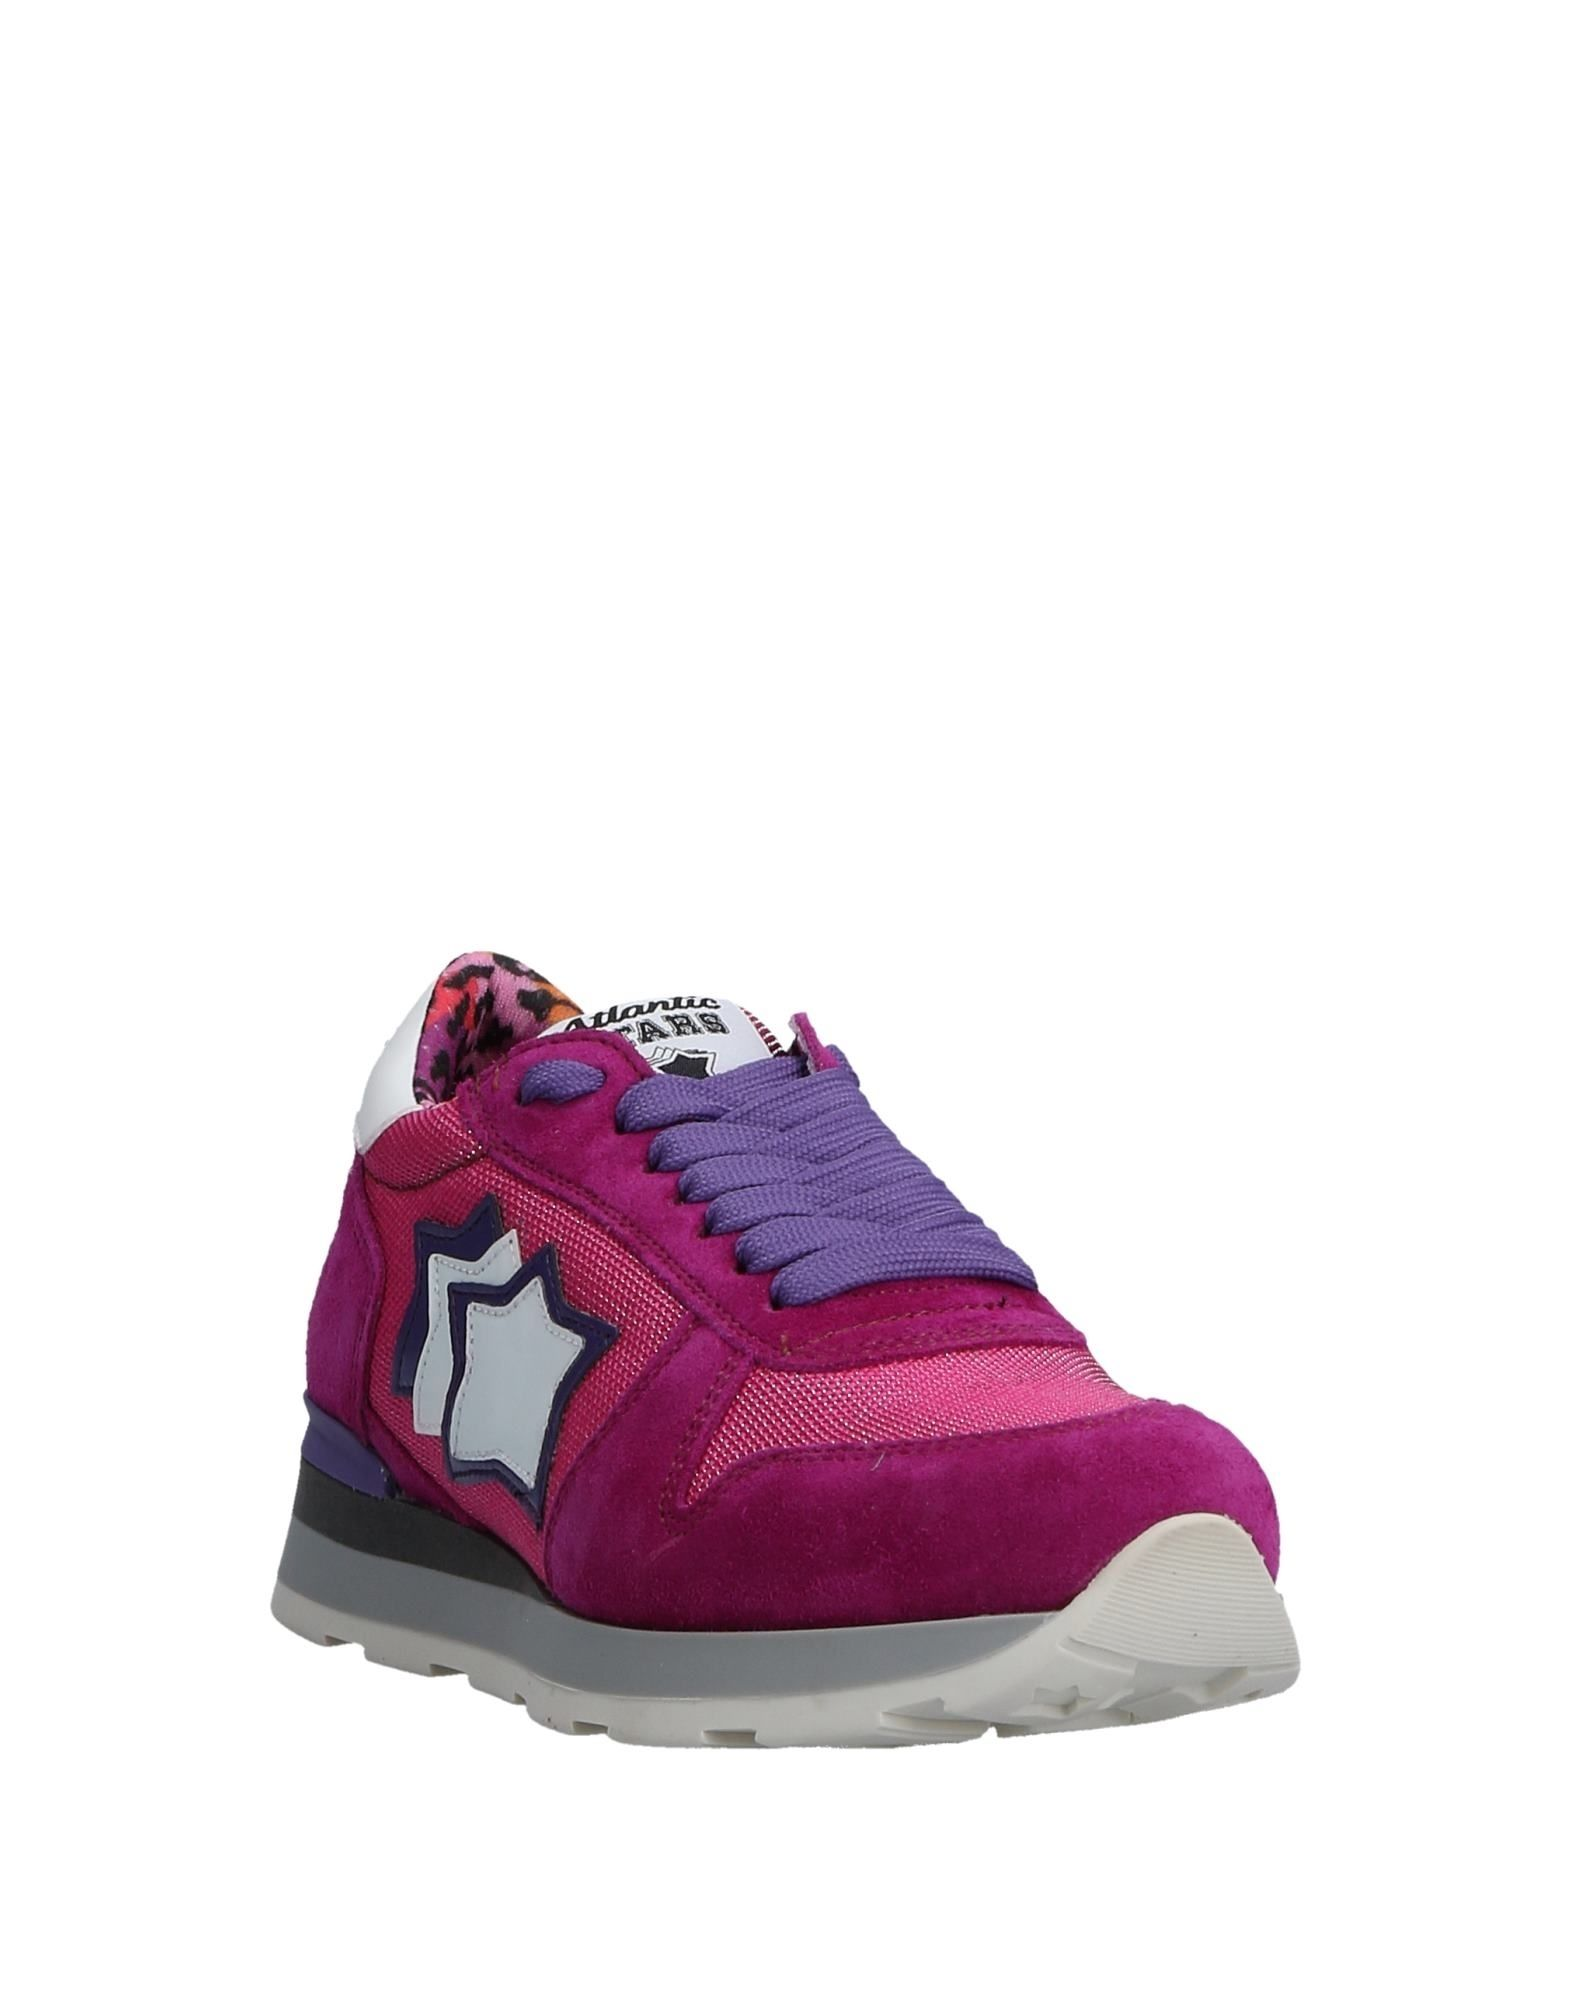 Gut um billige Damen Schuhe zu tragenAtlantic Stars Sneakers Damen billige  11524757RI 7266c3